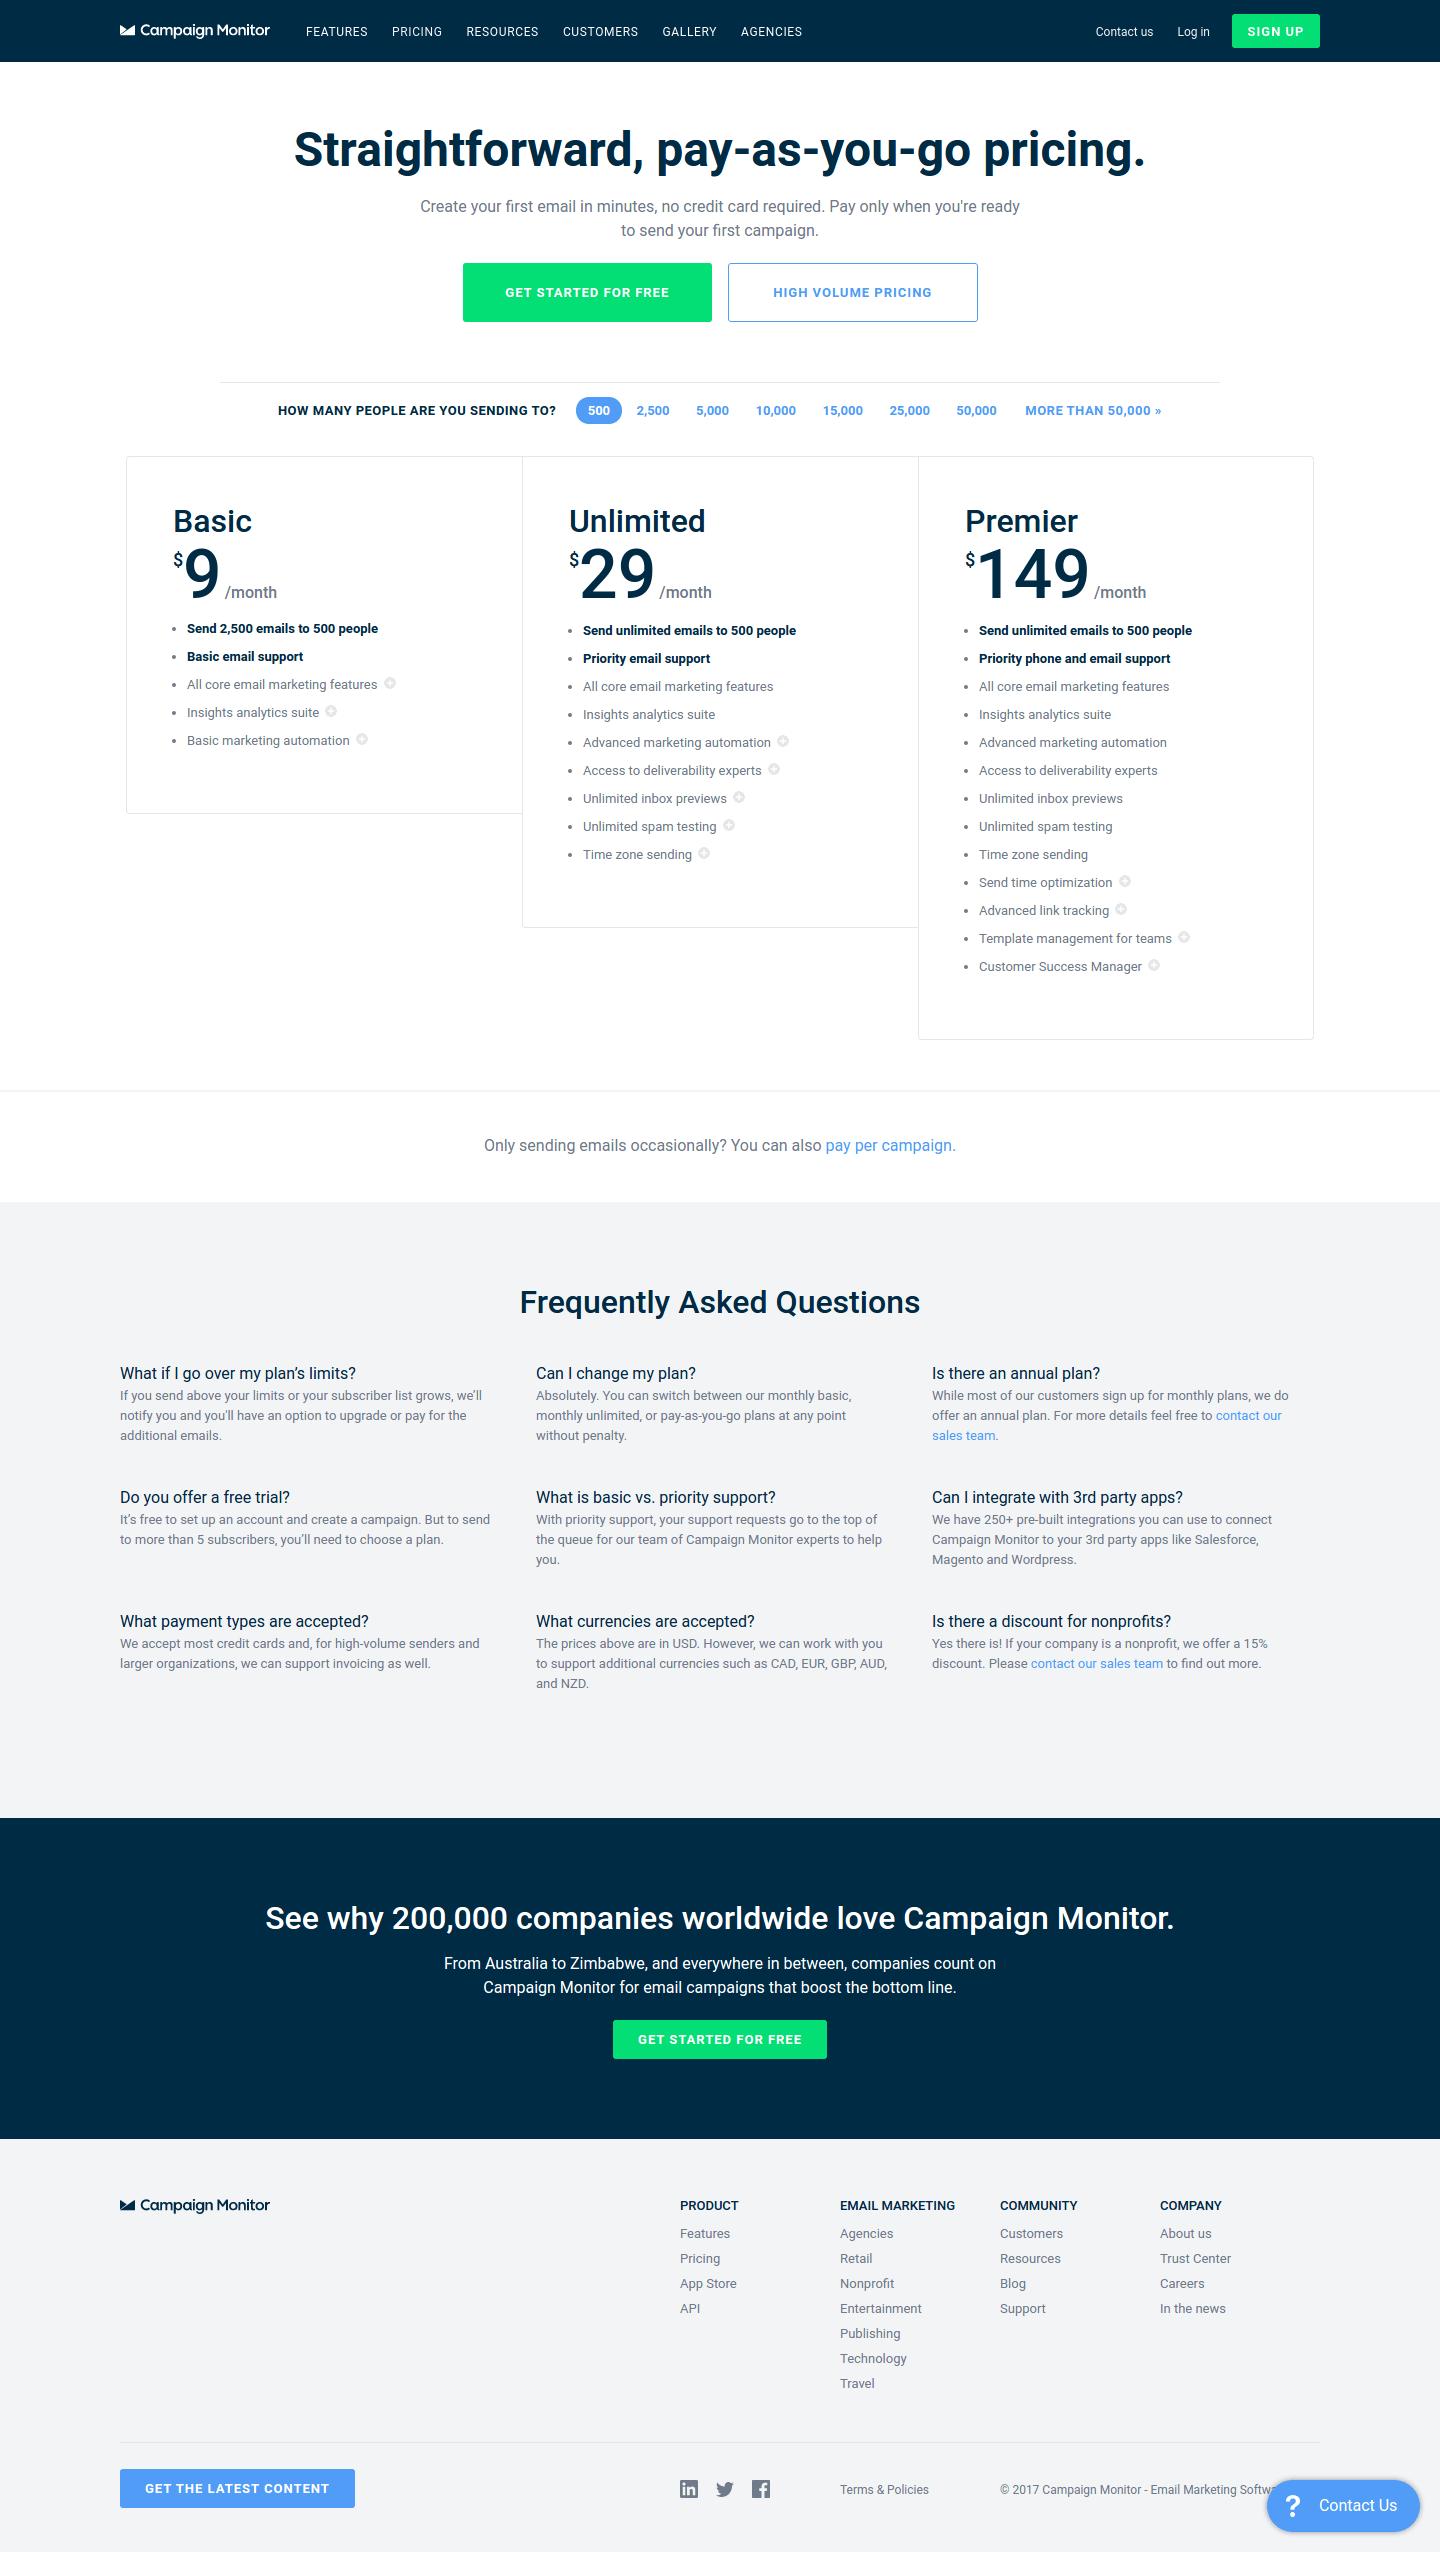 www.campaignmonitor.com-pricing-full